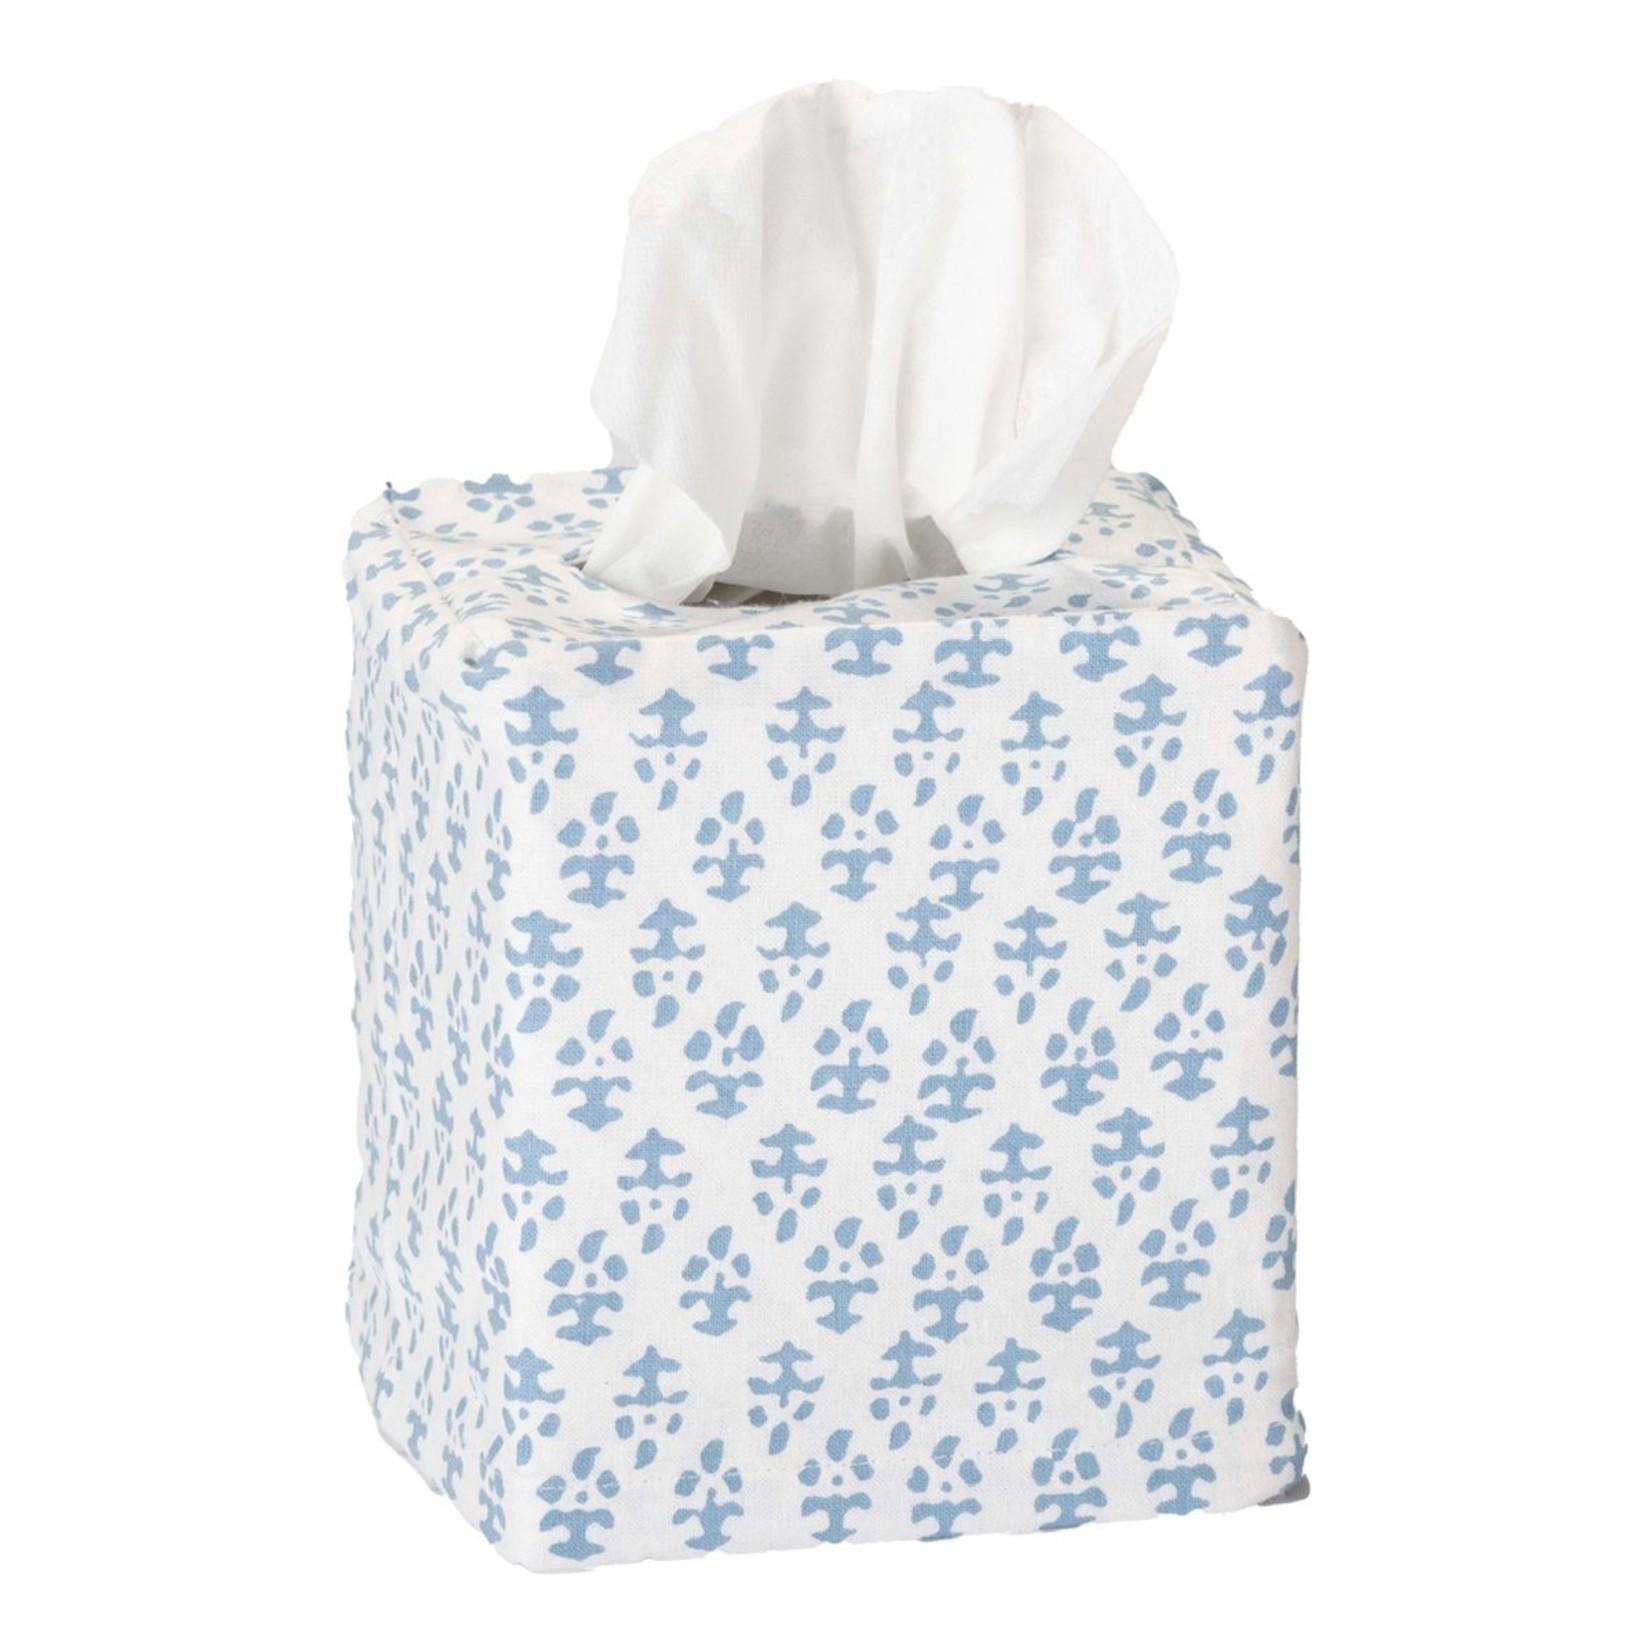 Amanda Lindroth Batik Tissue Box Cover